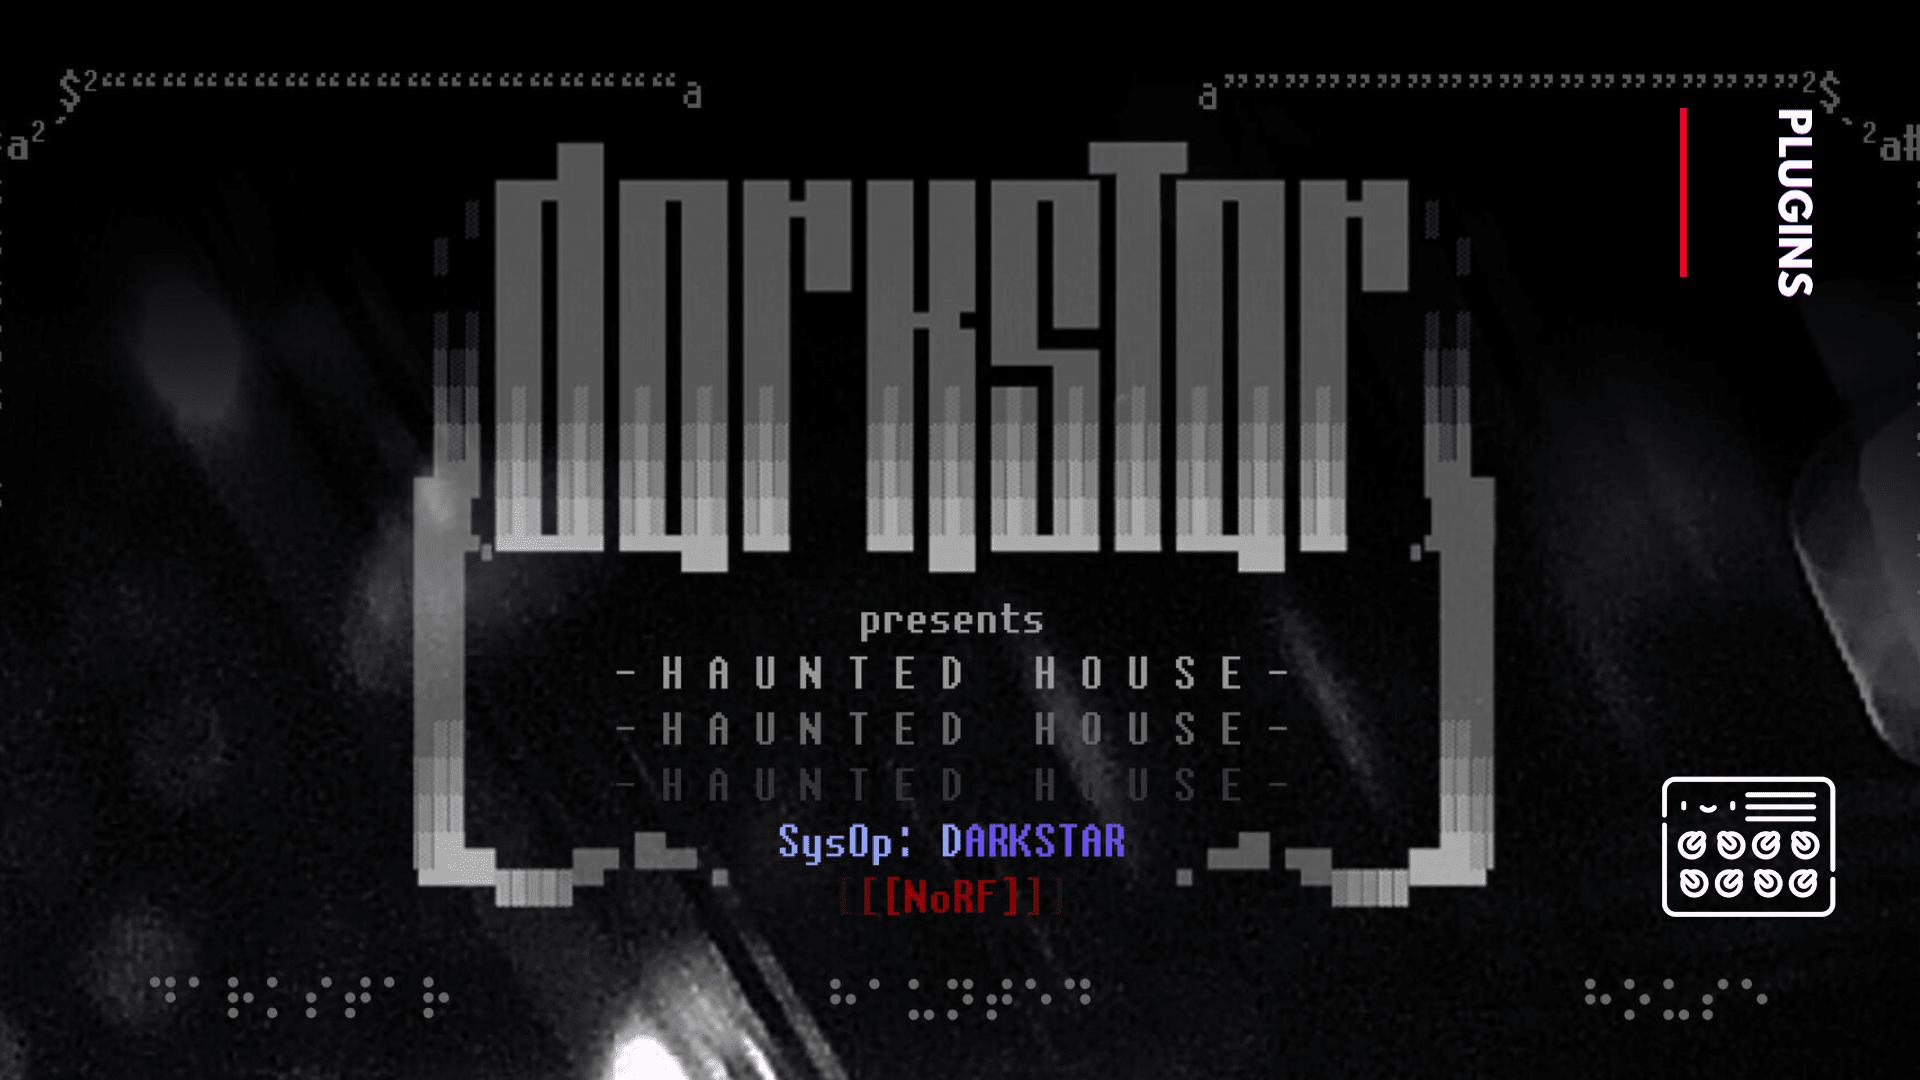 Spitfire Audio Darkstar Haunted House library